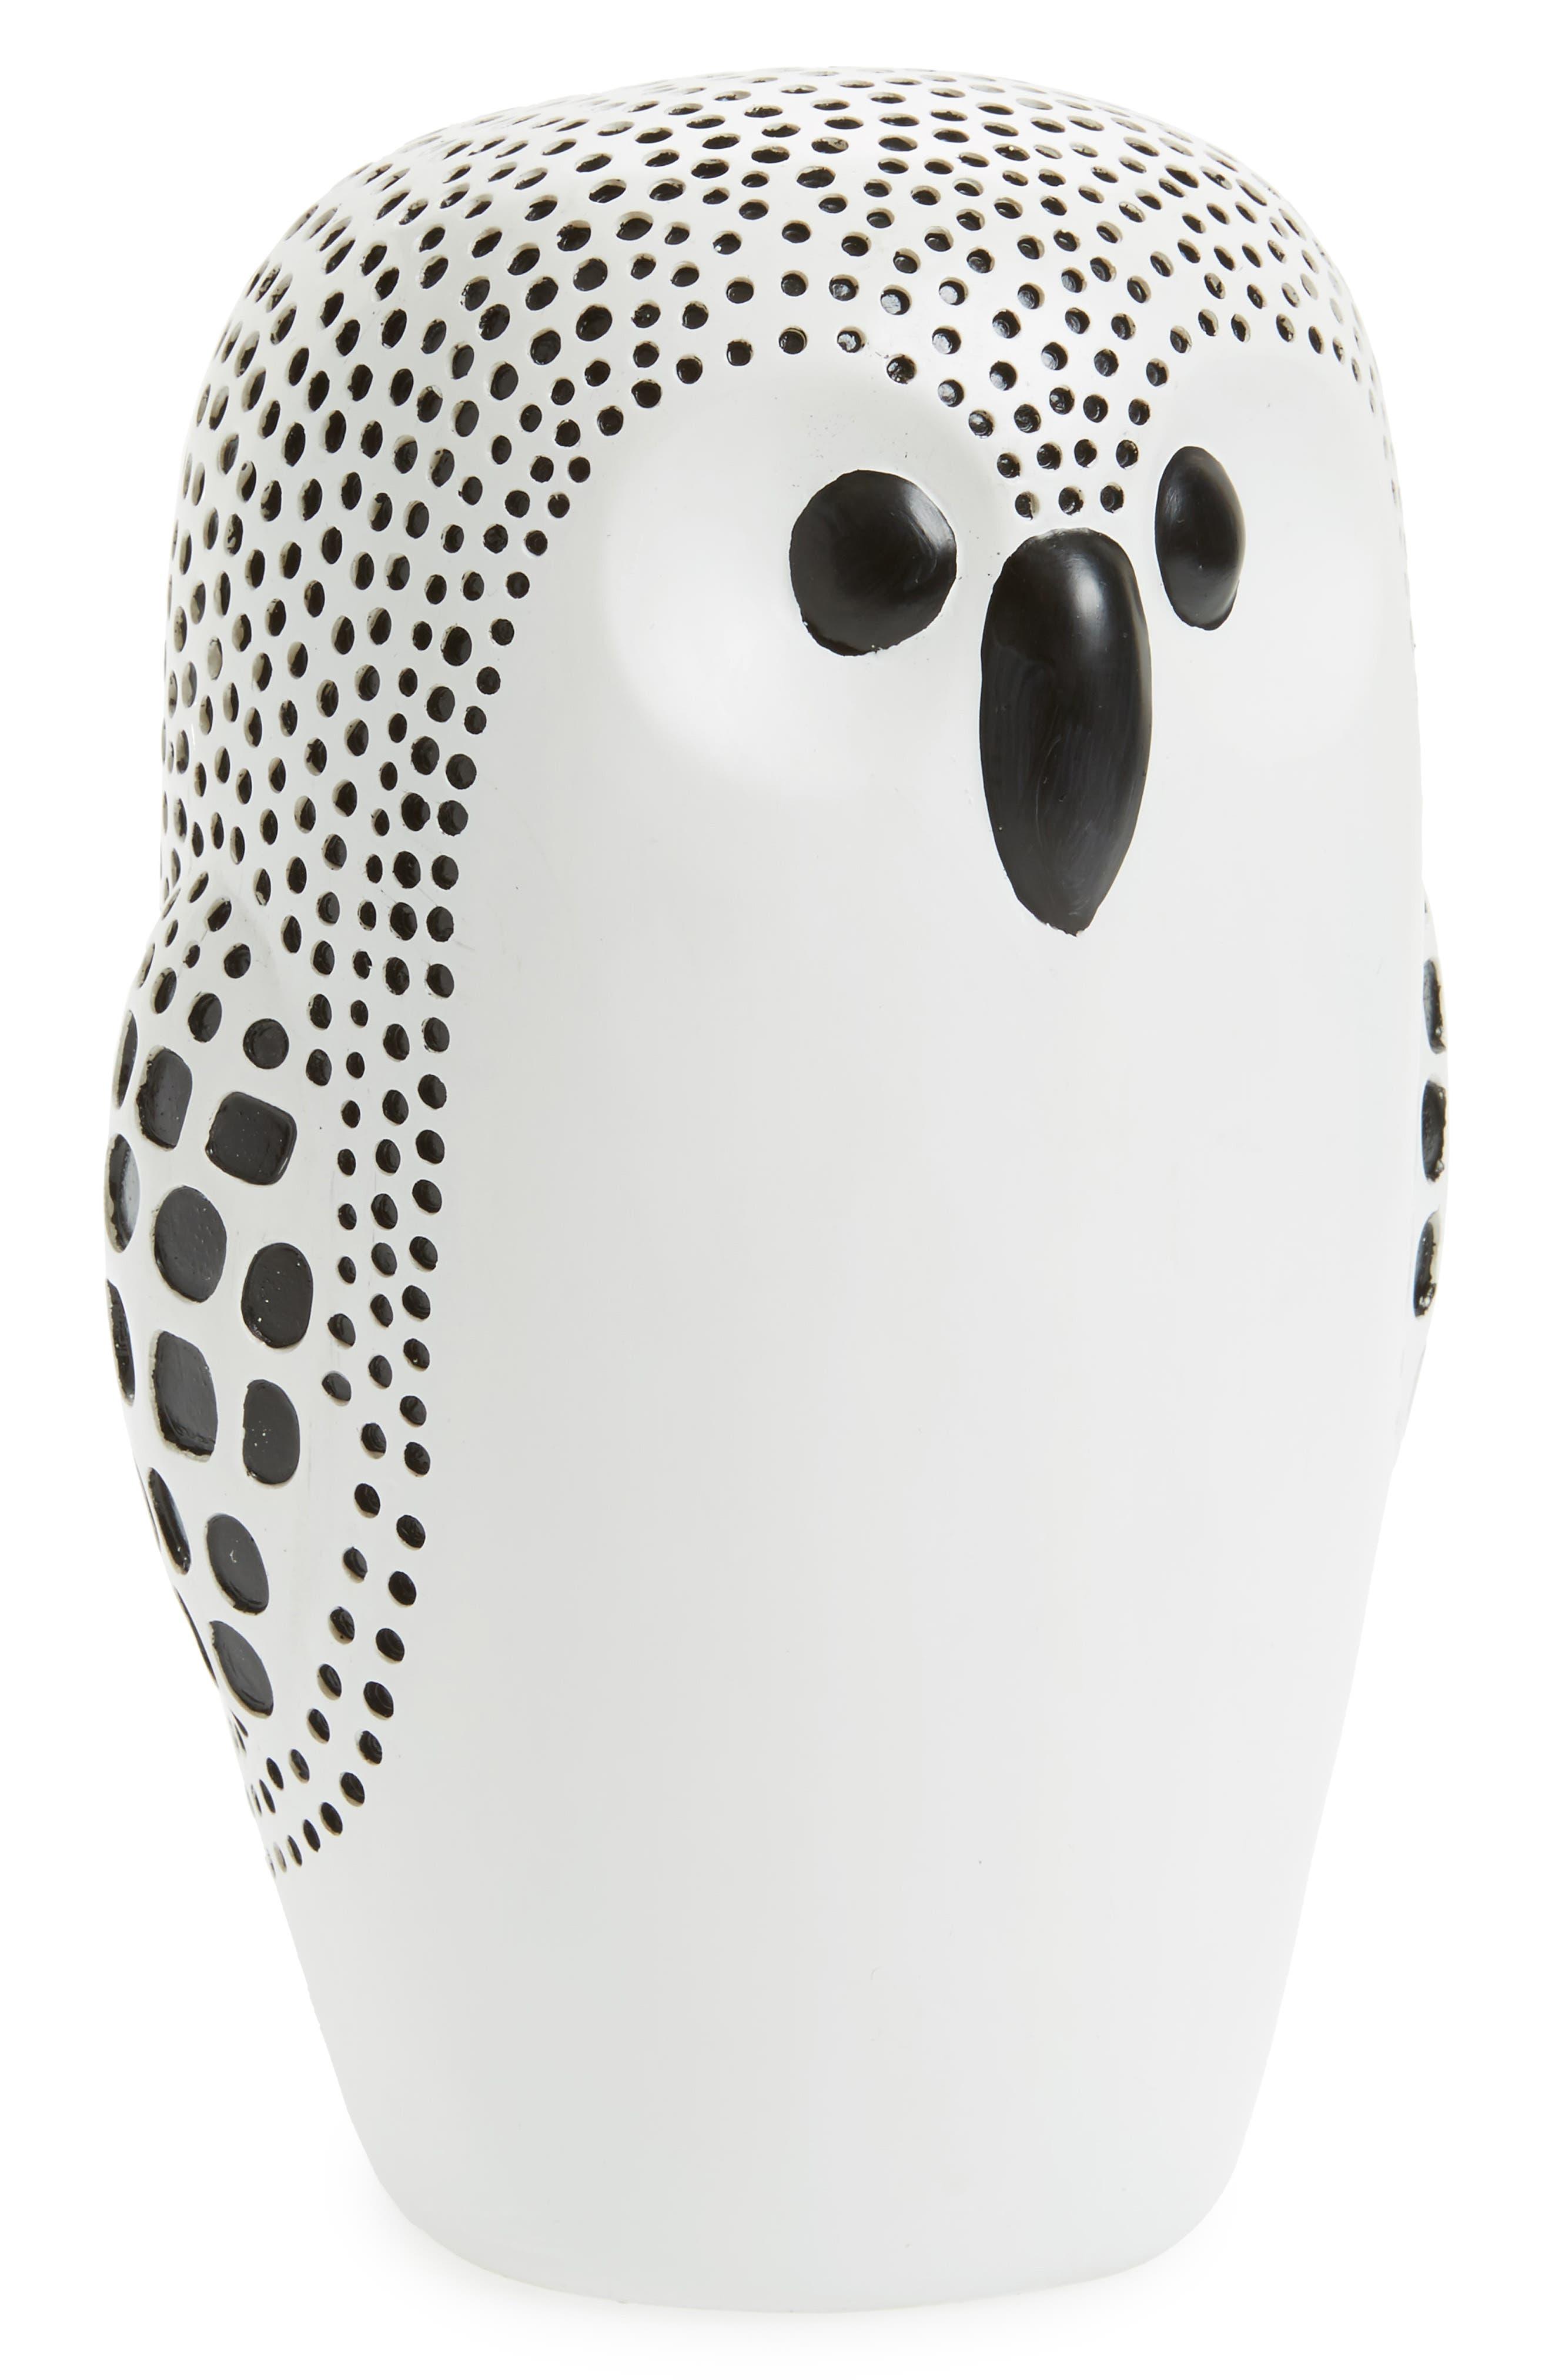 Main Image - Bovi Home Owl Decoration